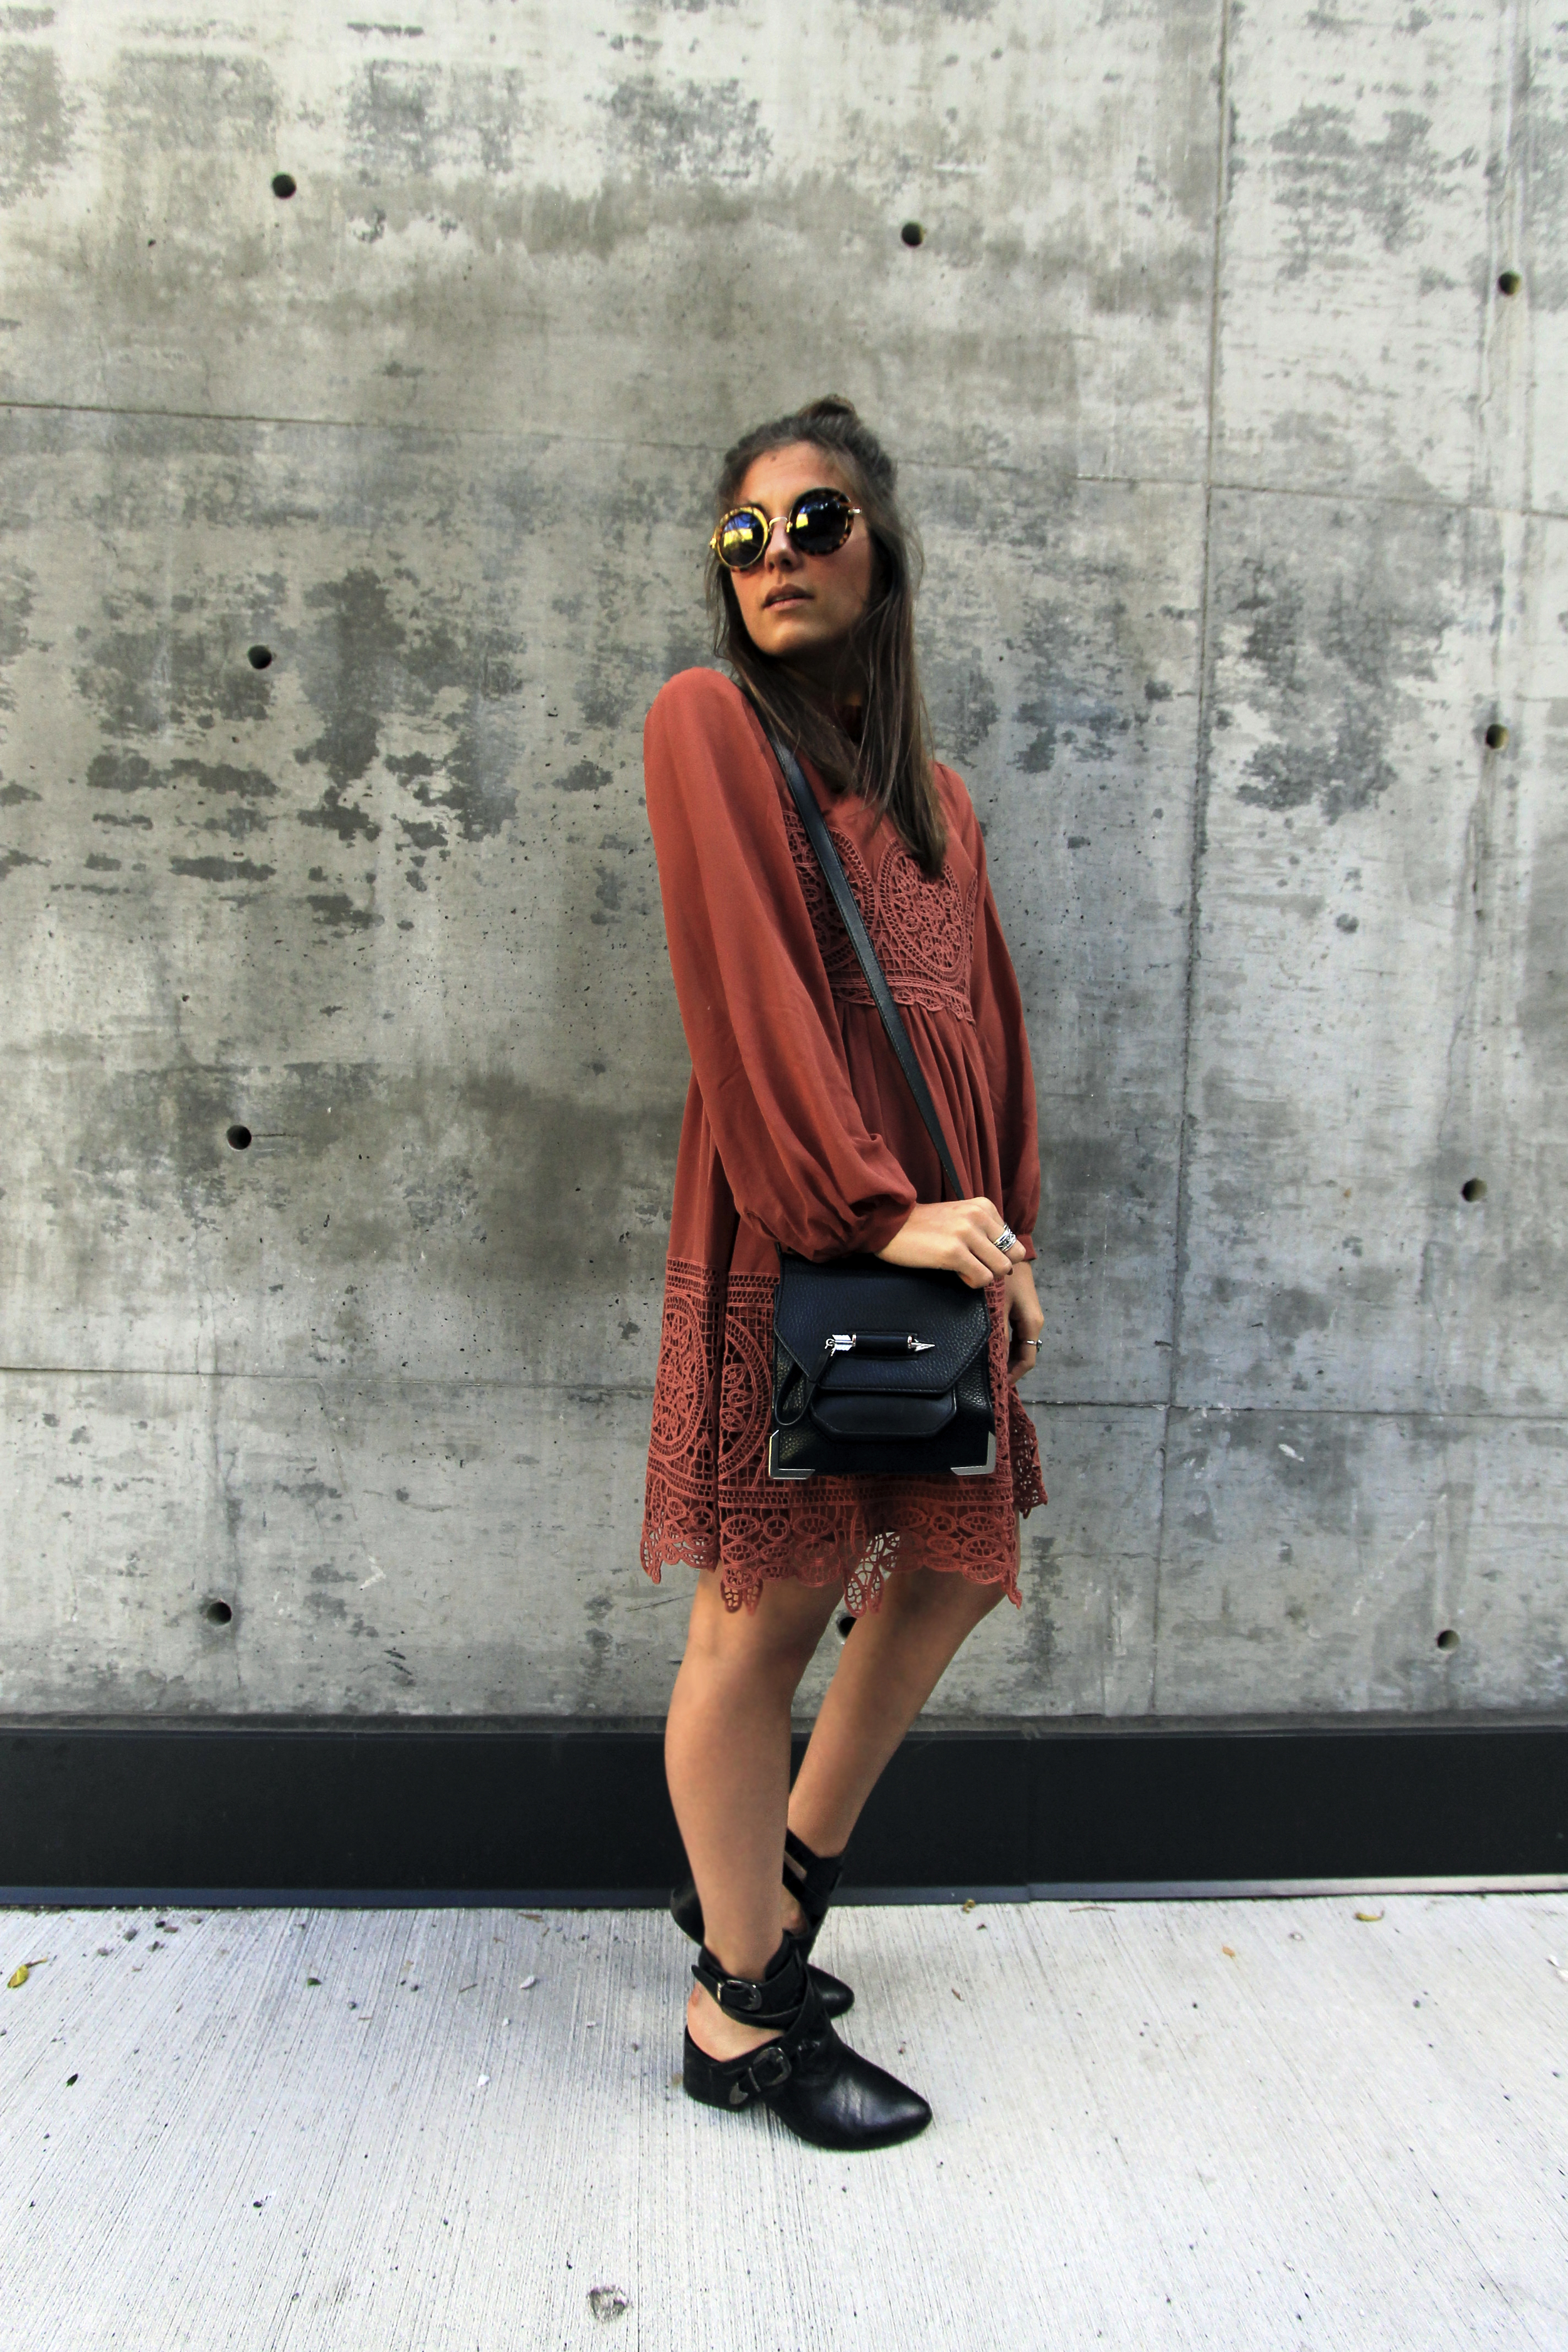 toronto fashion canadian bloggers style street asos.jpg